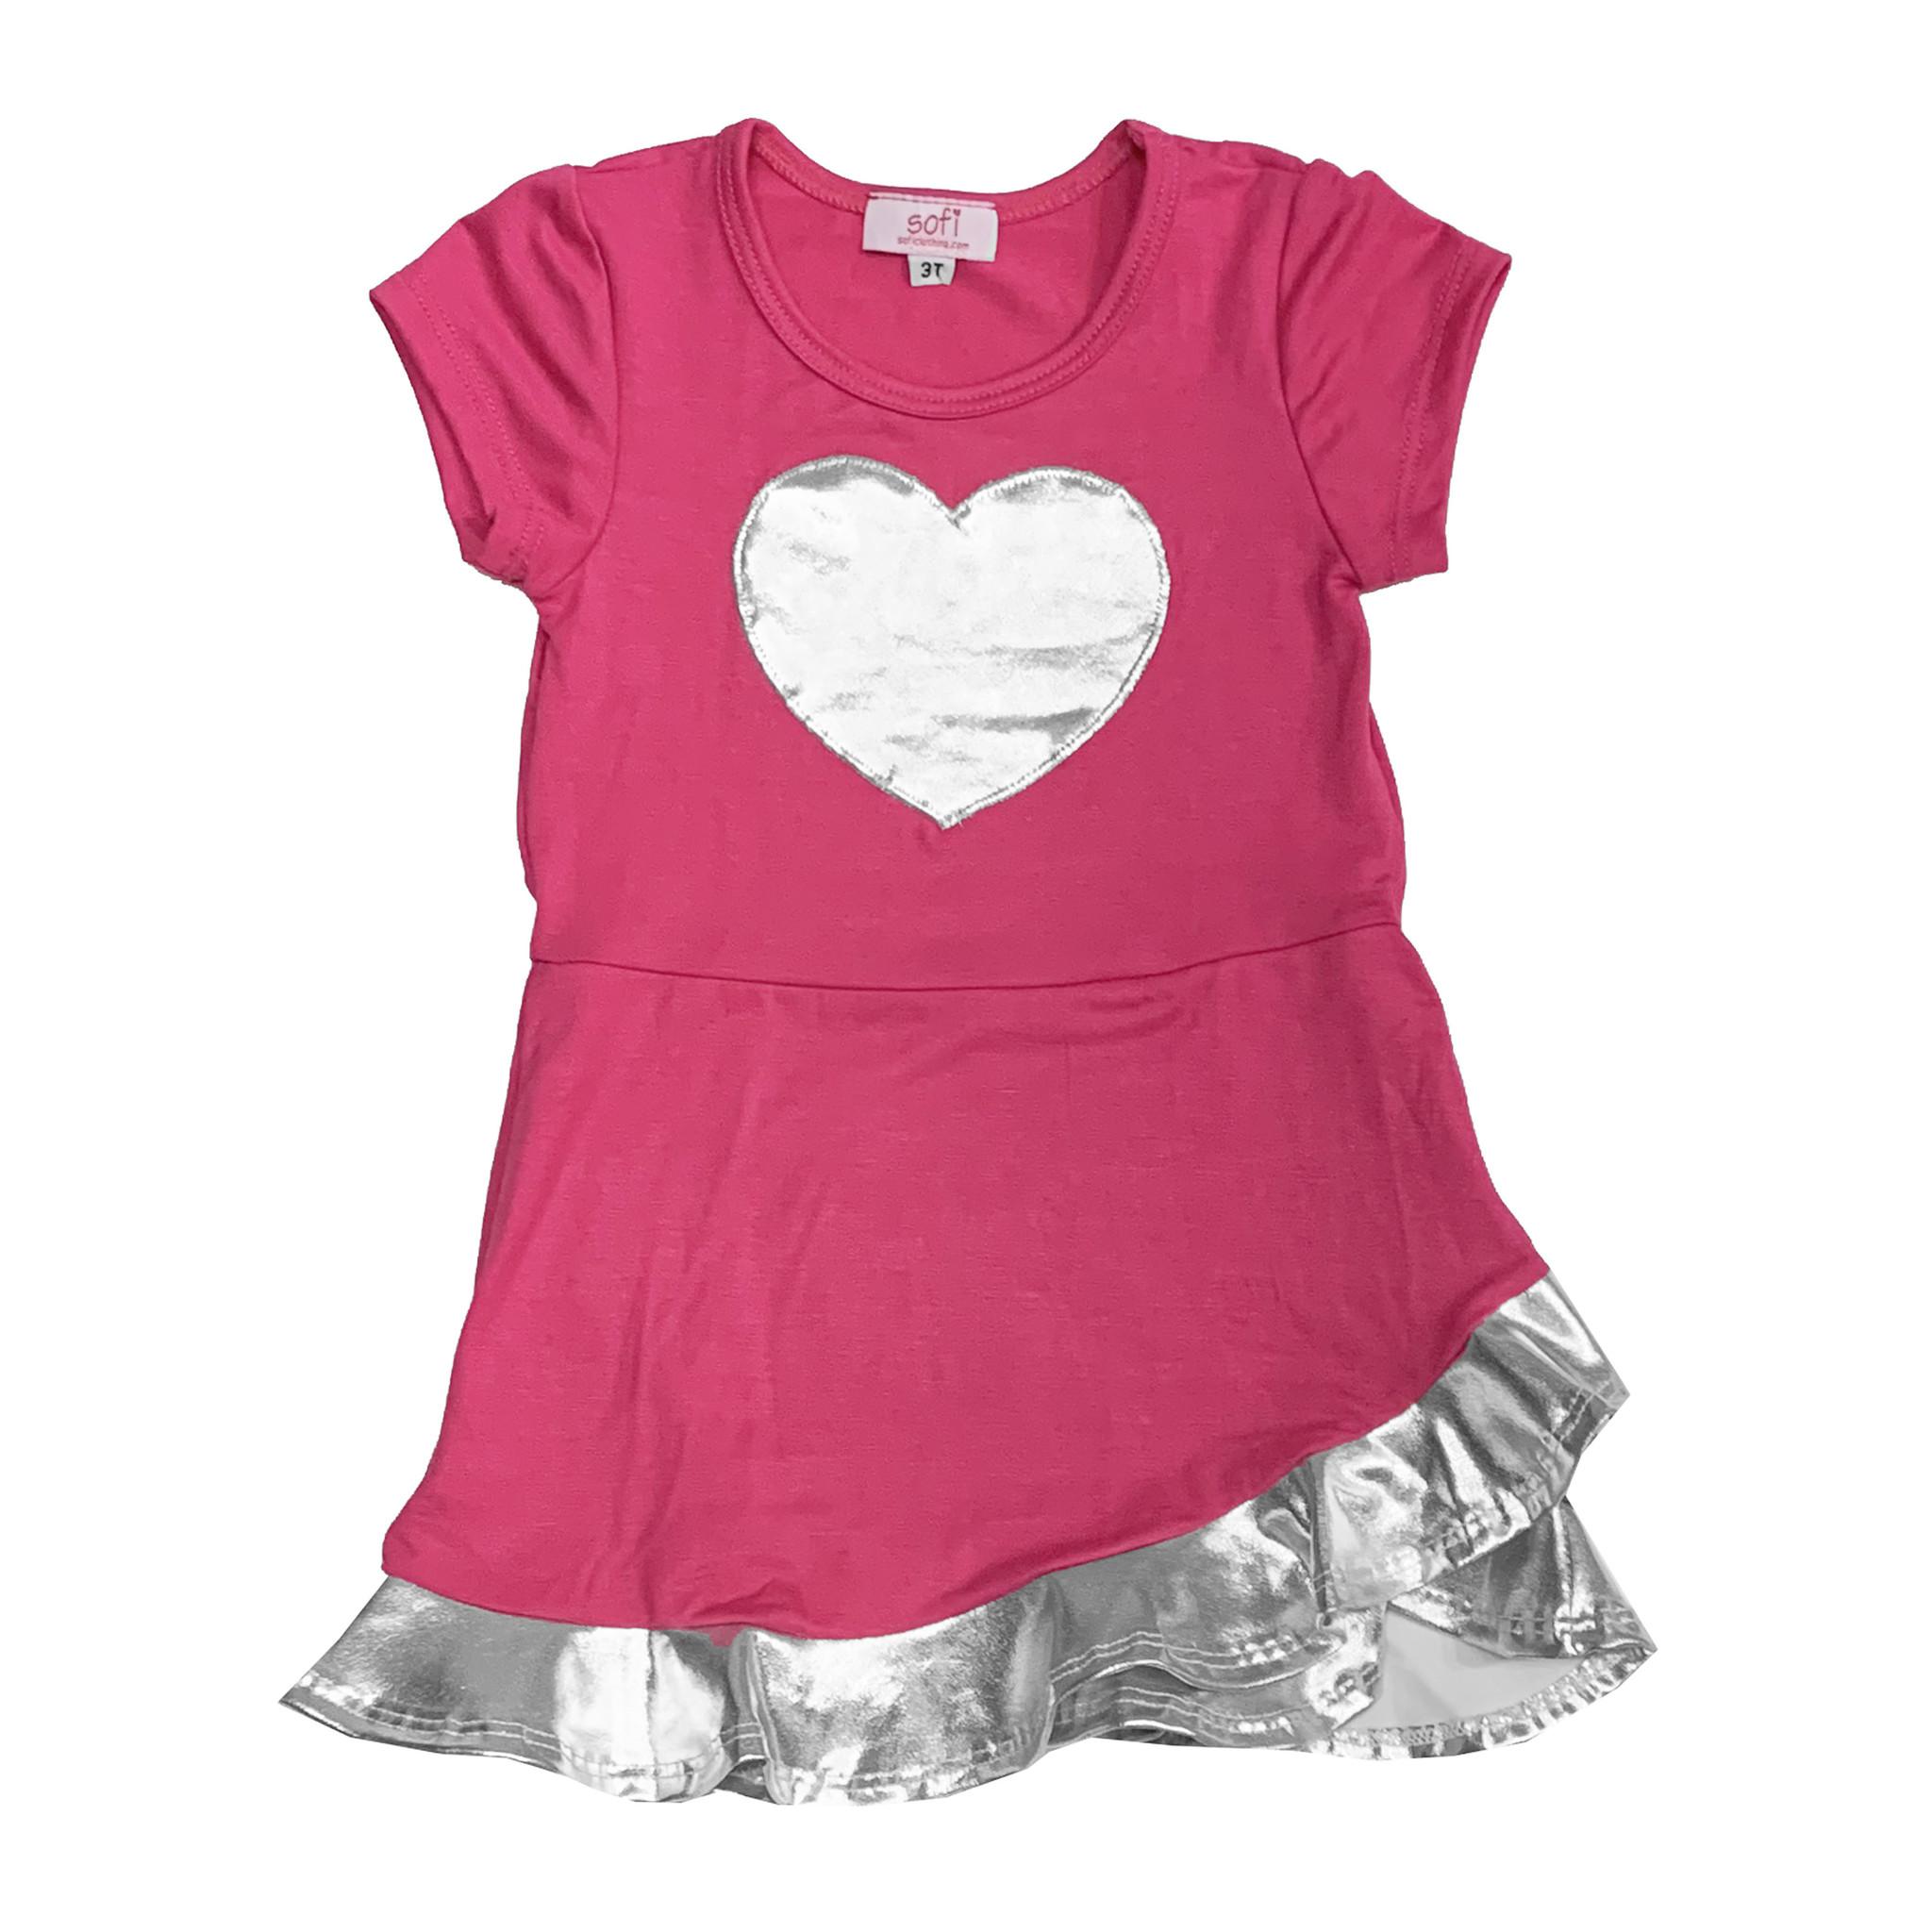 Sofi Short Sleeve Pink & Silver Ruffle Dress